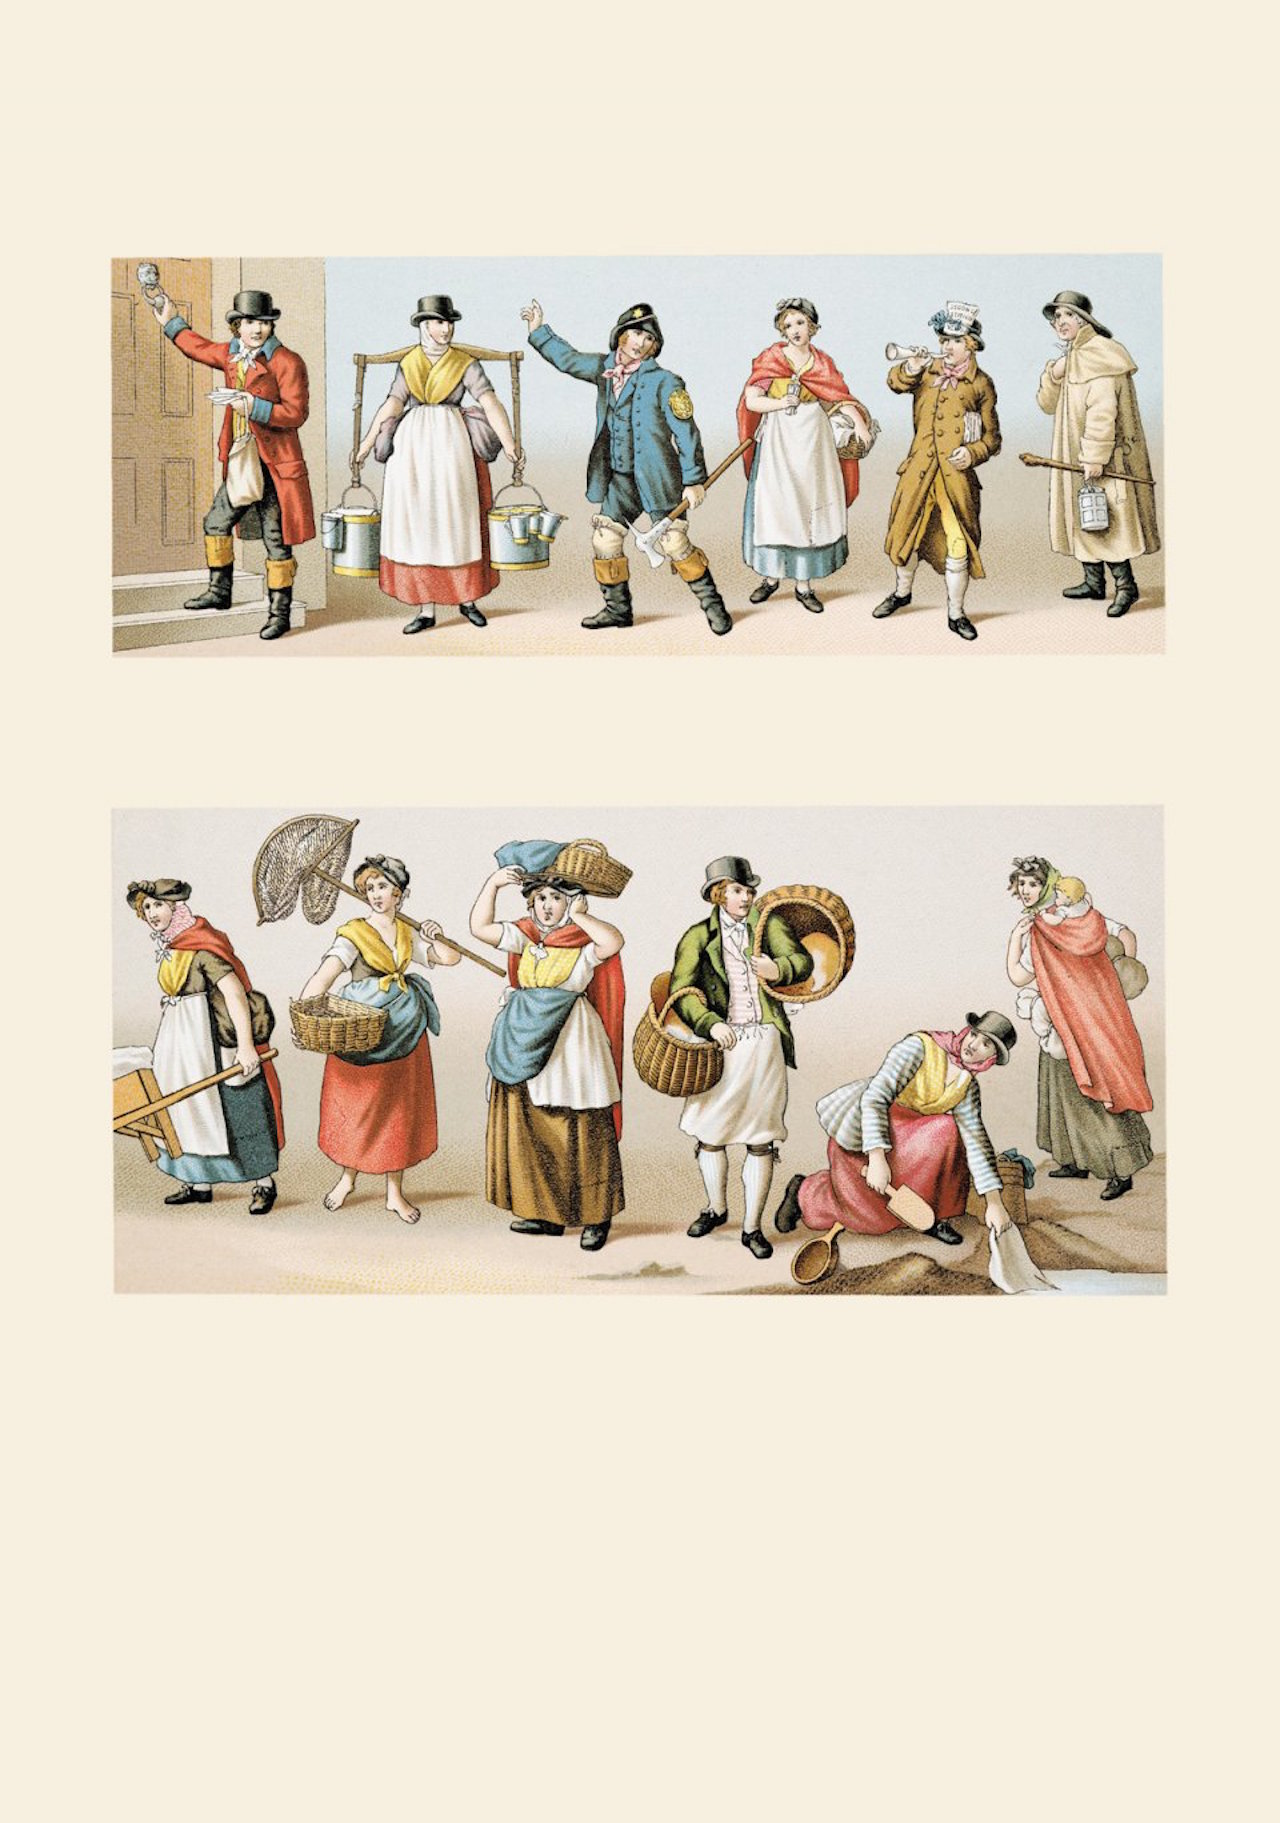 641a_racinet_costume_history_hc_ko_05425_1512111433_id_1021027